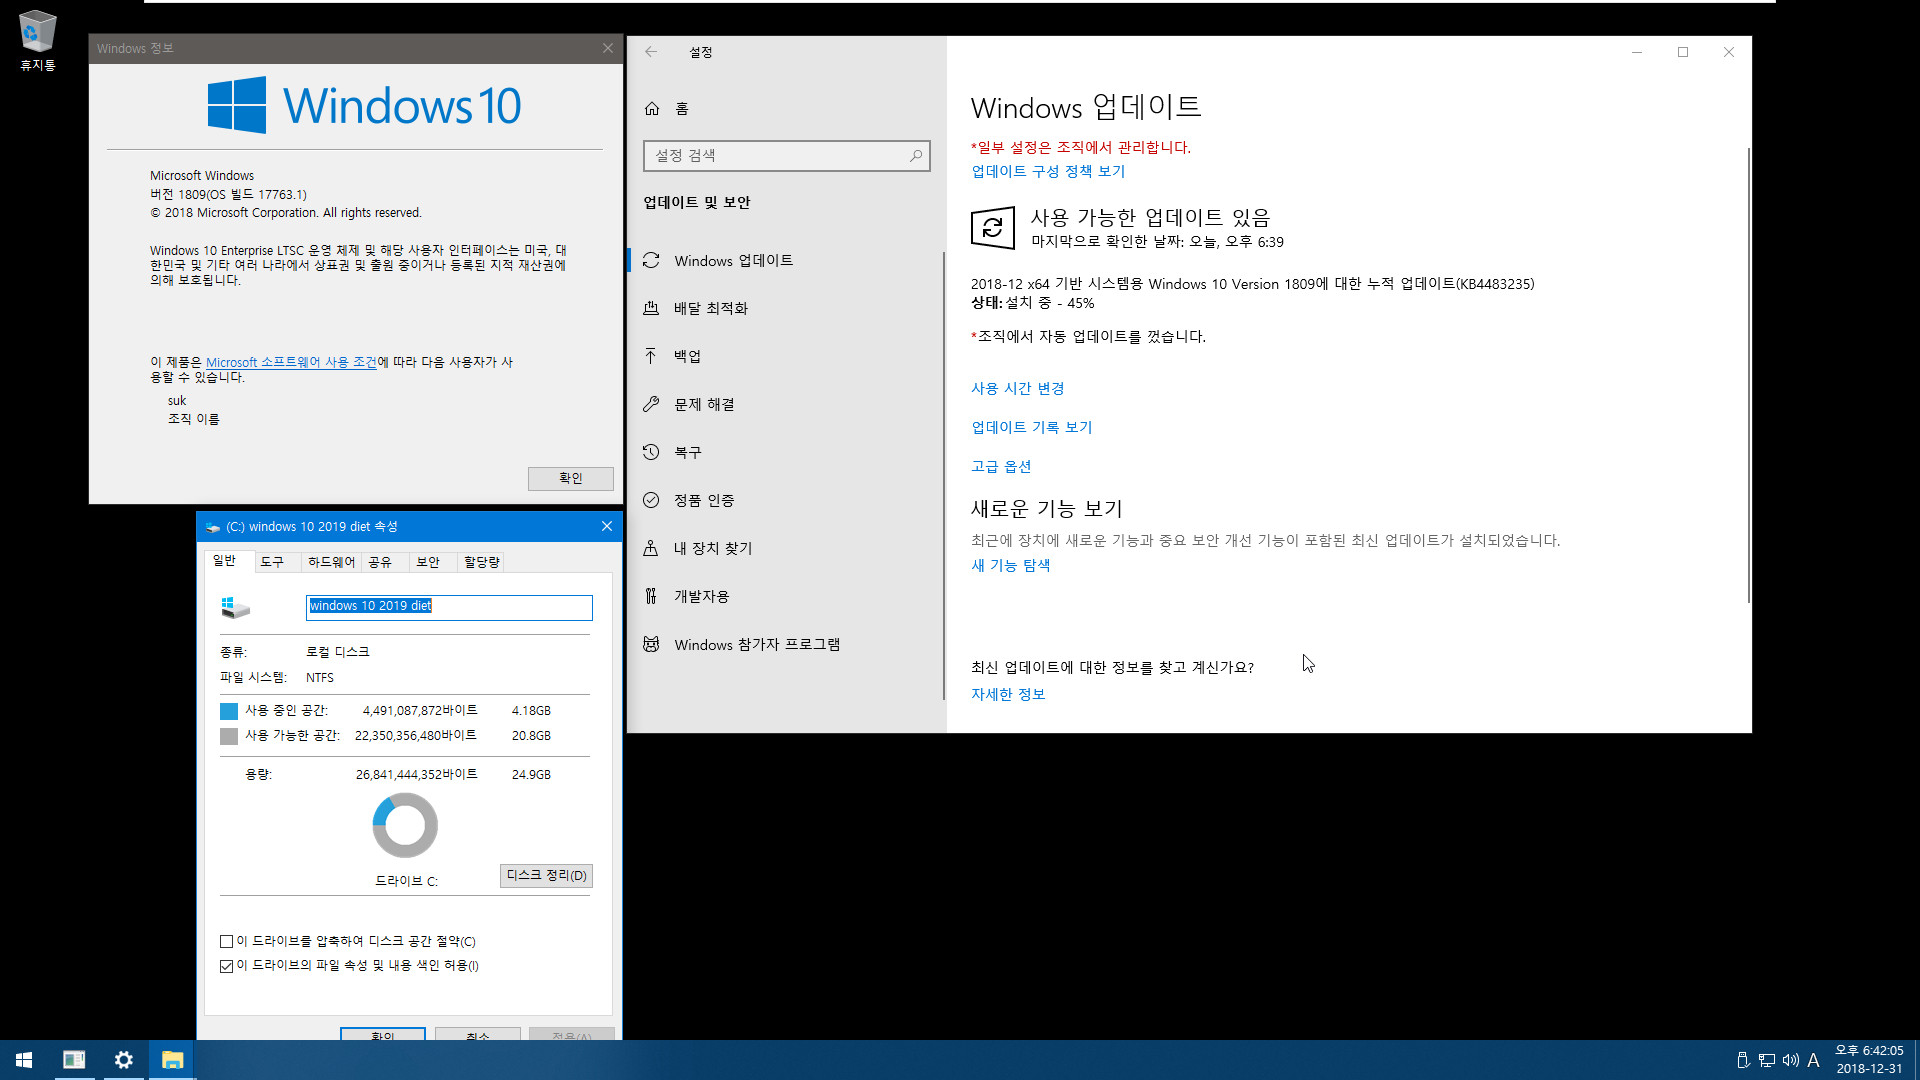 windows 10 2019 다이어트판.iso [2019 LTSC 64비트] - vhd 만들어서 vmware에 연결하여 부팅하기 2018-12-31_184206.jpg